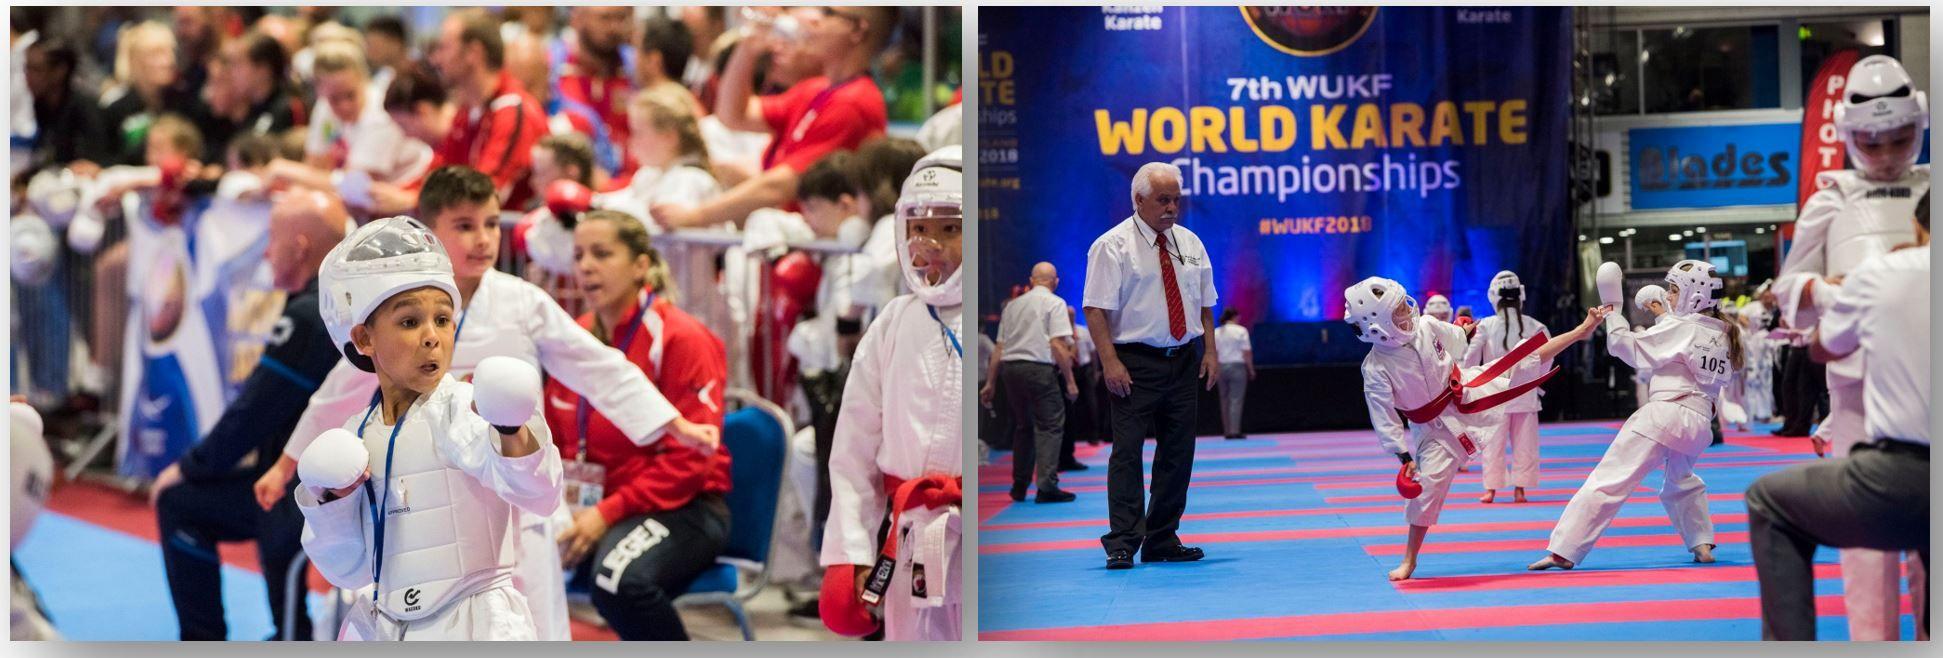 8th WUKF World Karate Championship 2019 - KONGRES – Europe Events